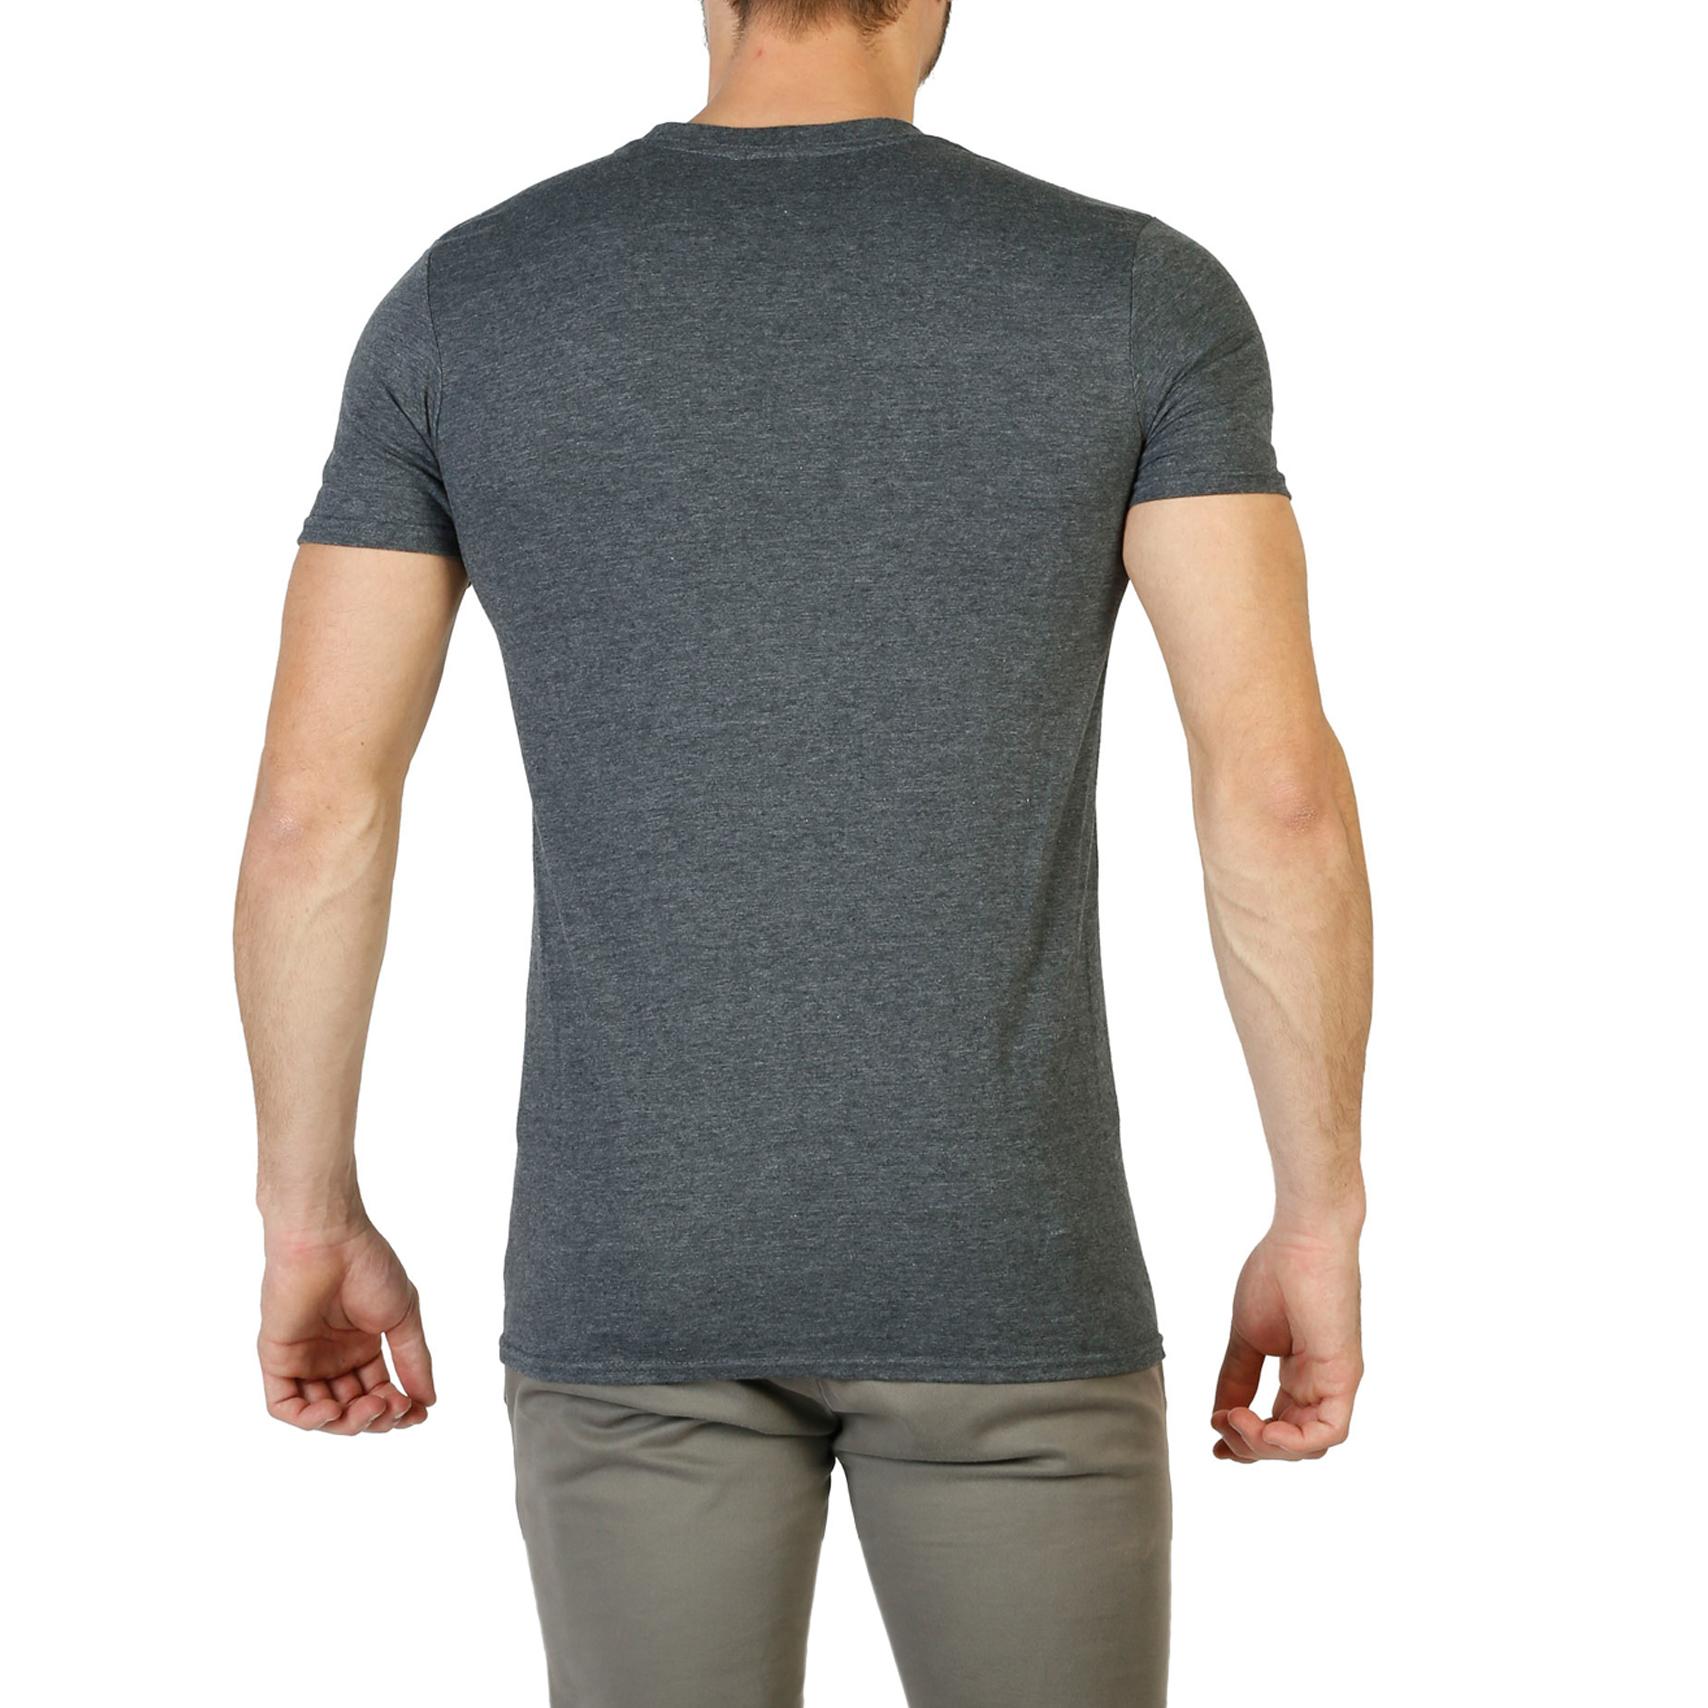 Camisetas-DC-Comics-Hombre-RGMTS012-Rojo-Gris-Primavera-Verano